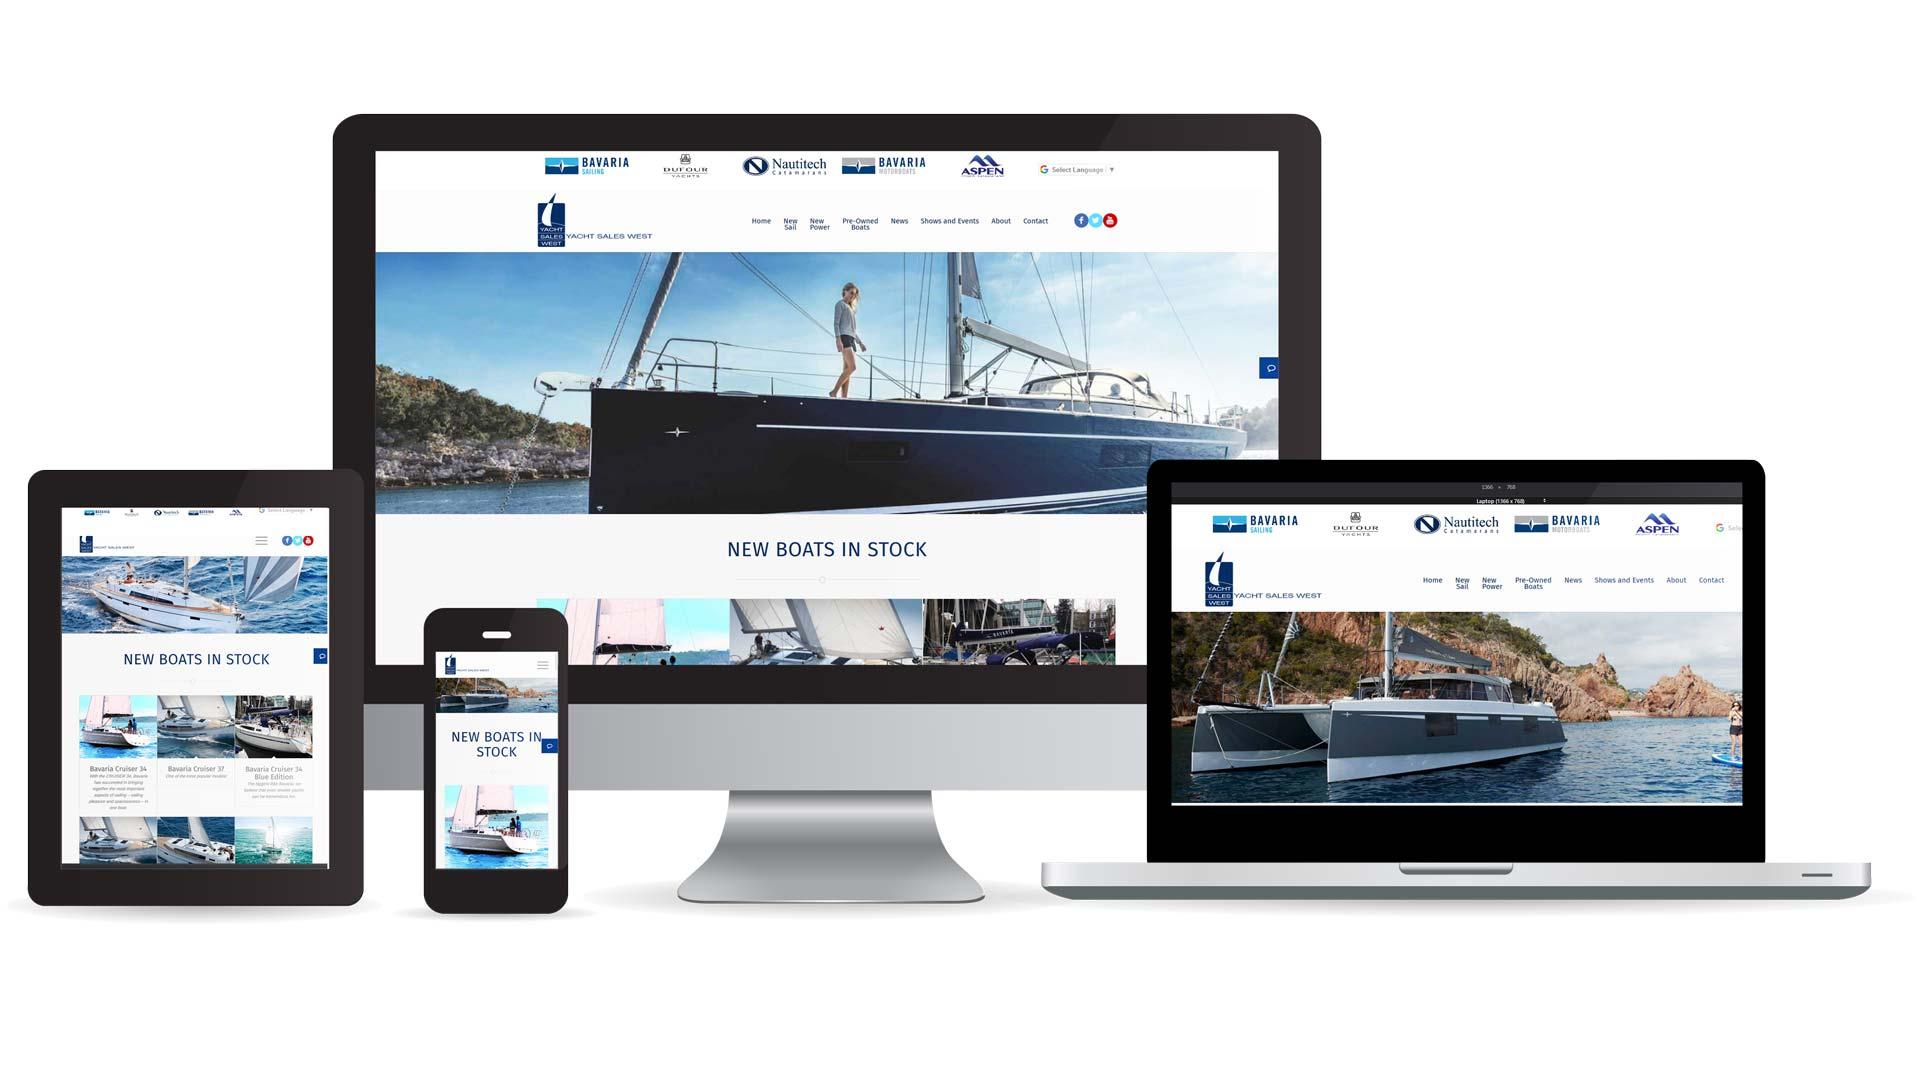 Yacht Sales West website multidevice layout